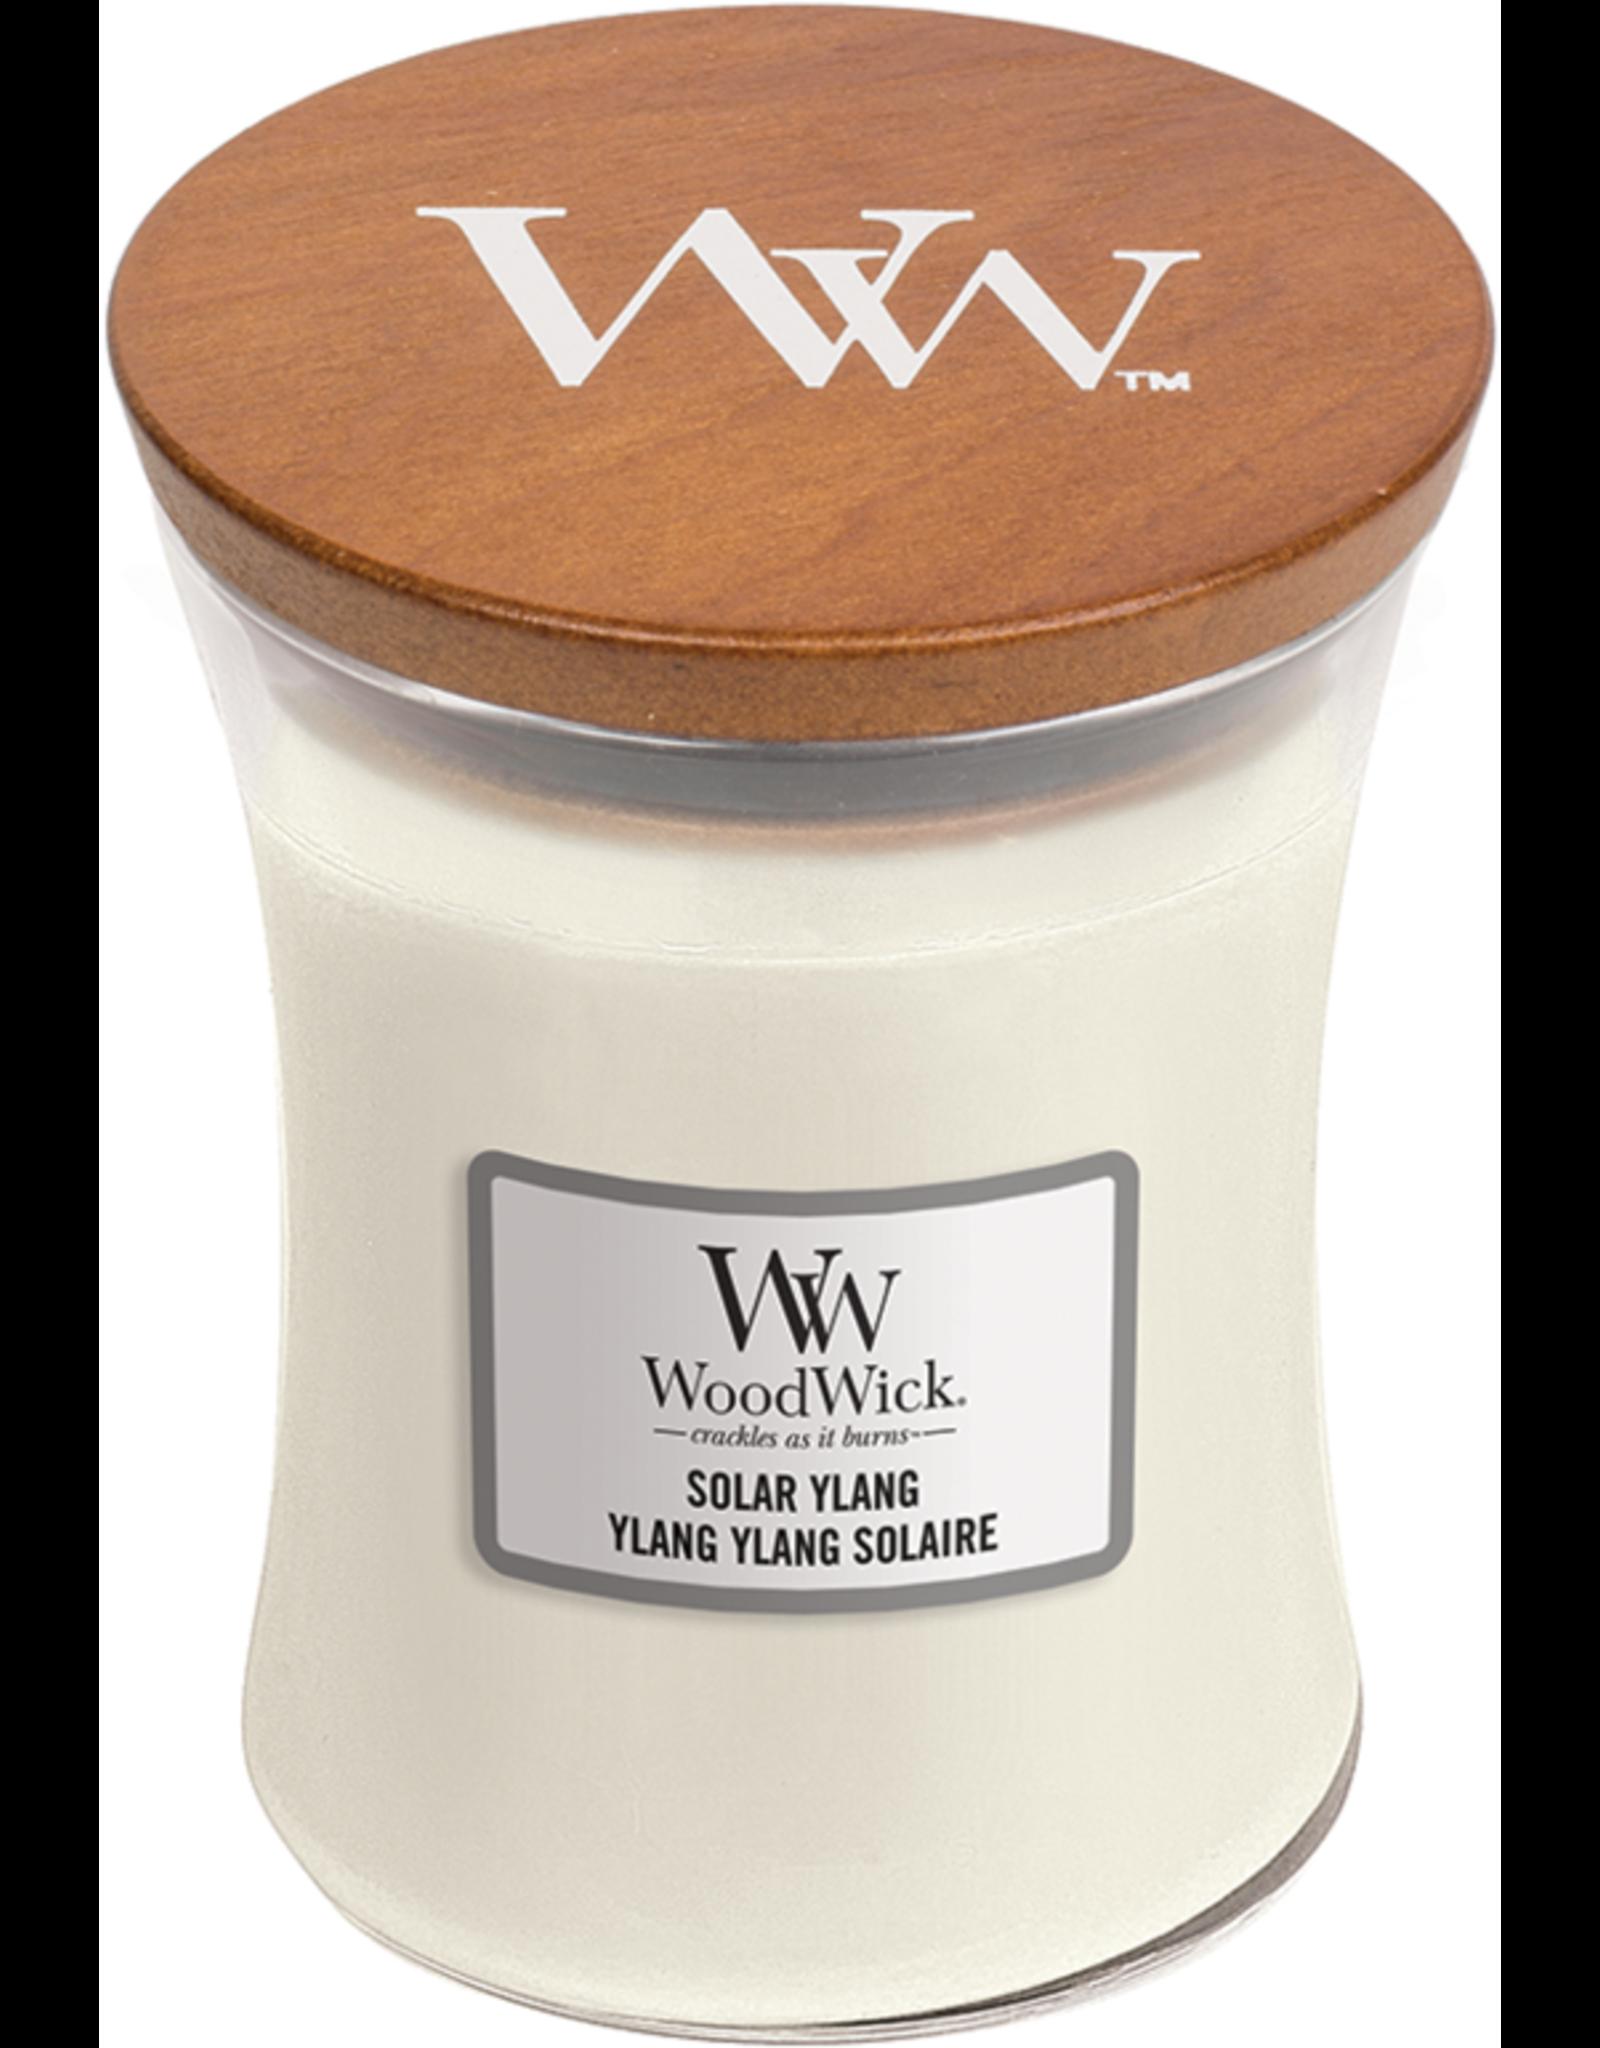 Woodwick Woodwick Solar Ylang Medium Candle